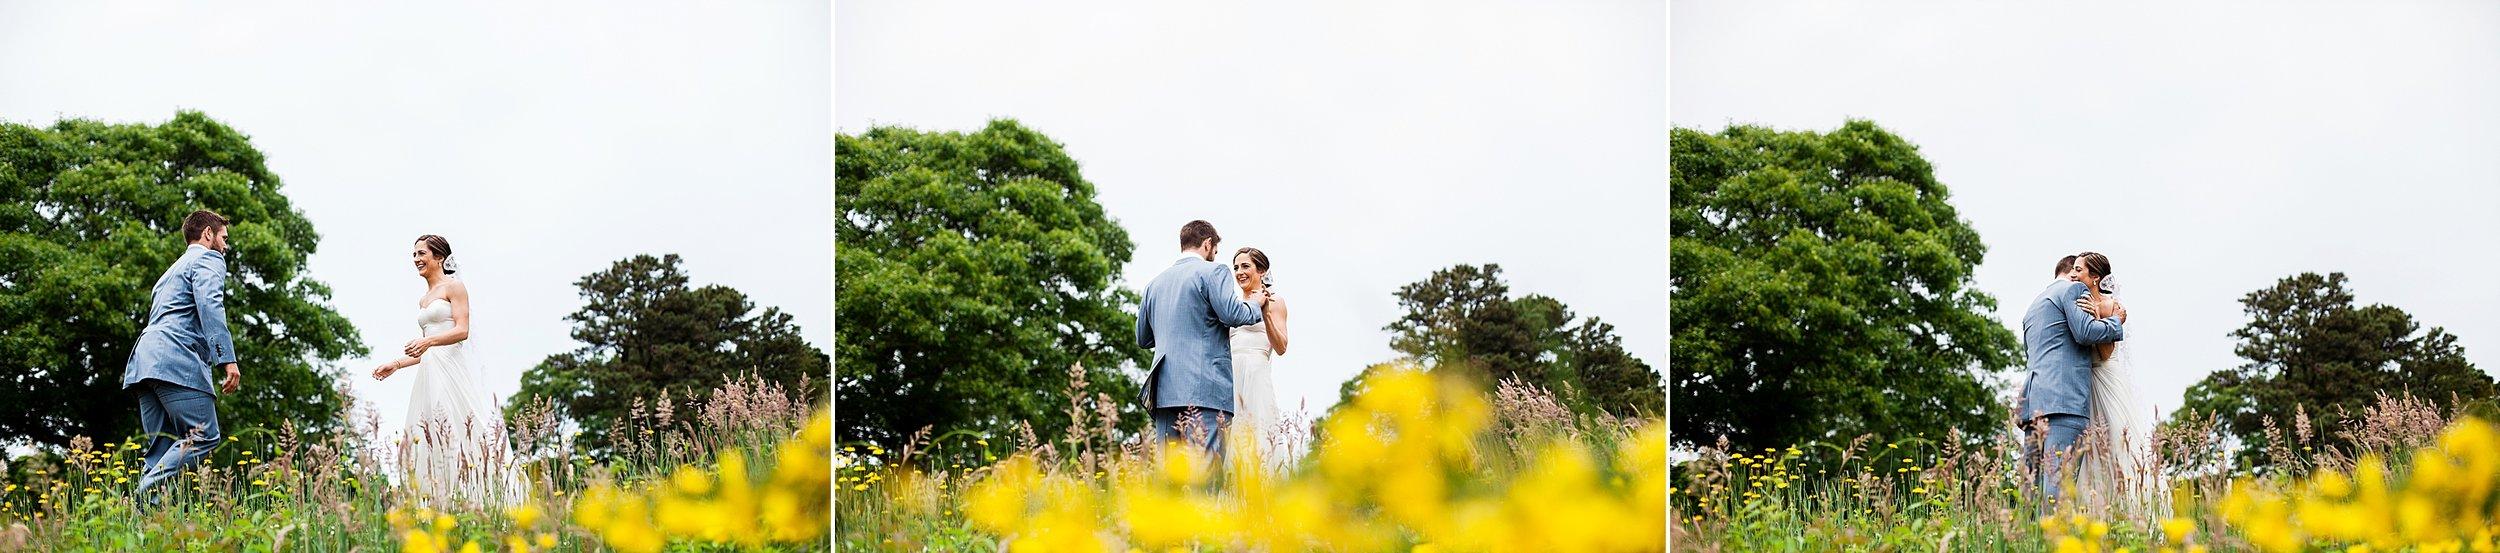 016 los angeles wedding photographer todd danforth photography cape cod.jpg